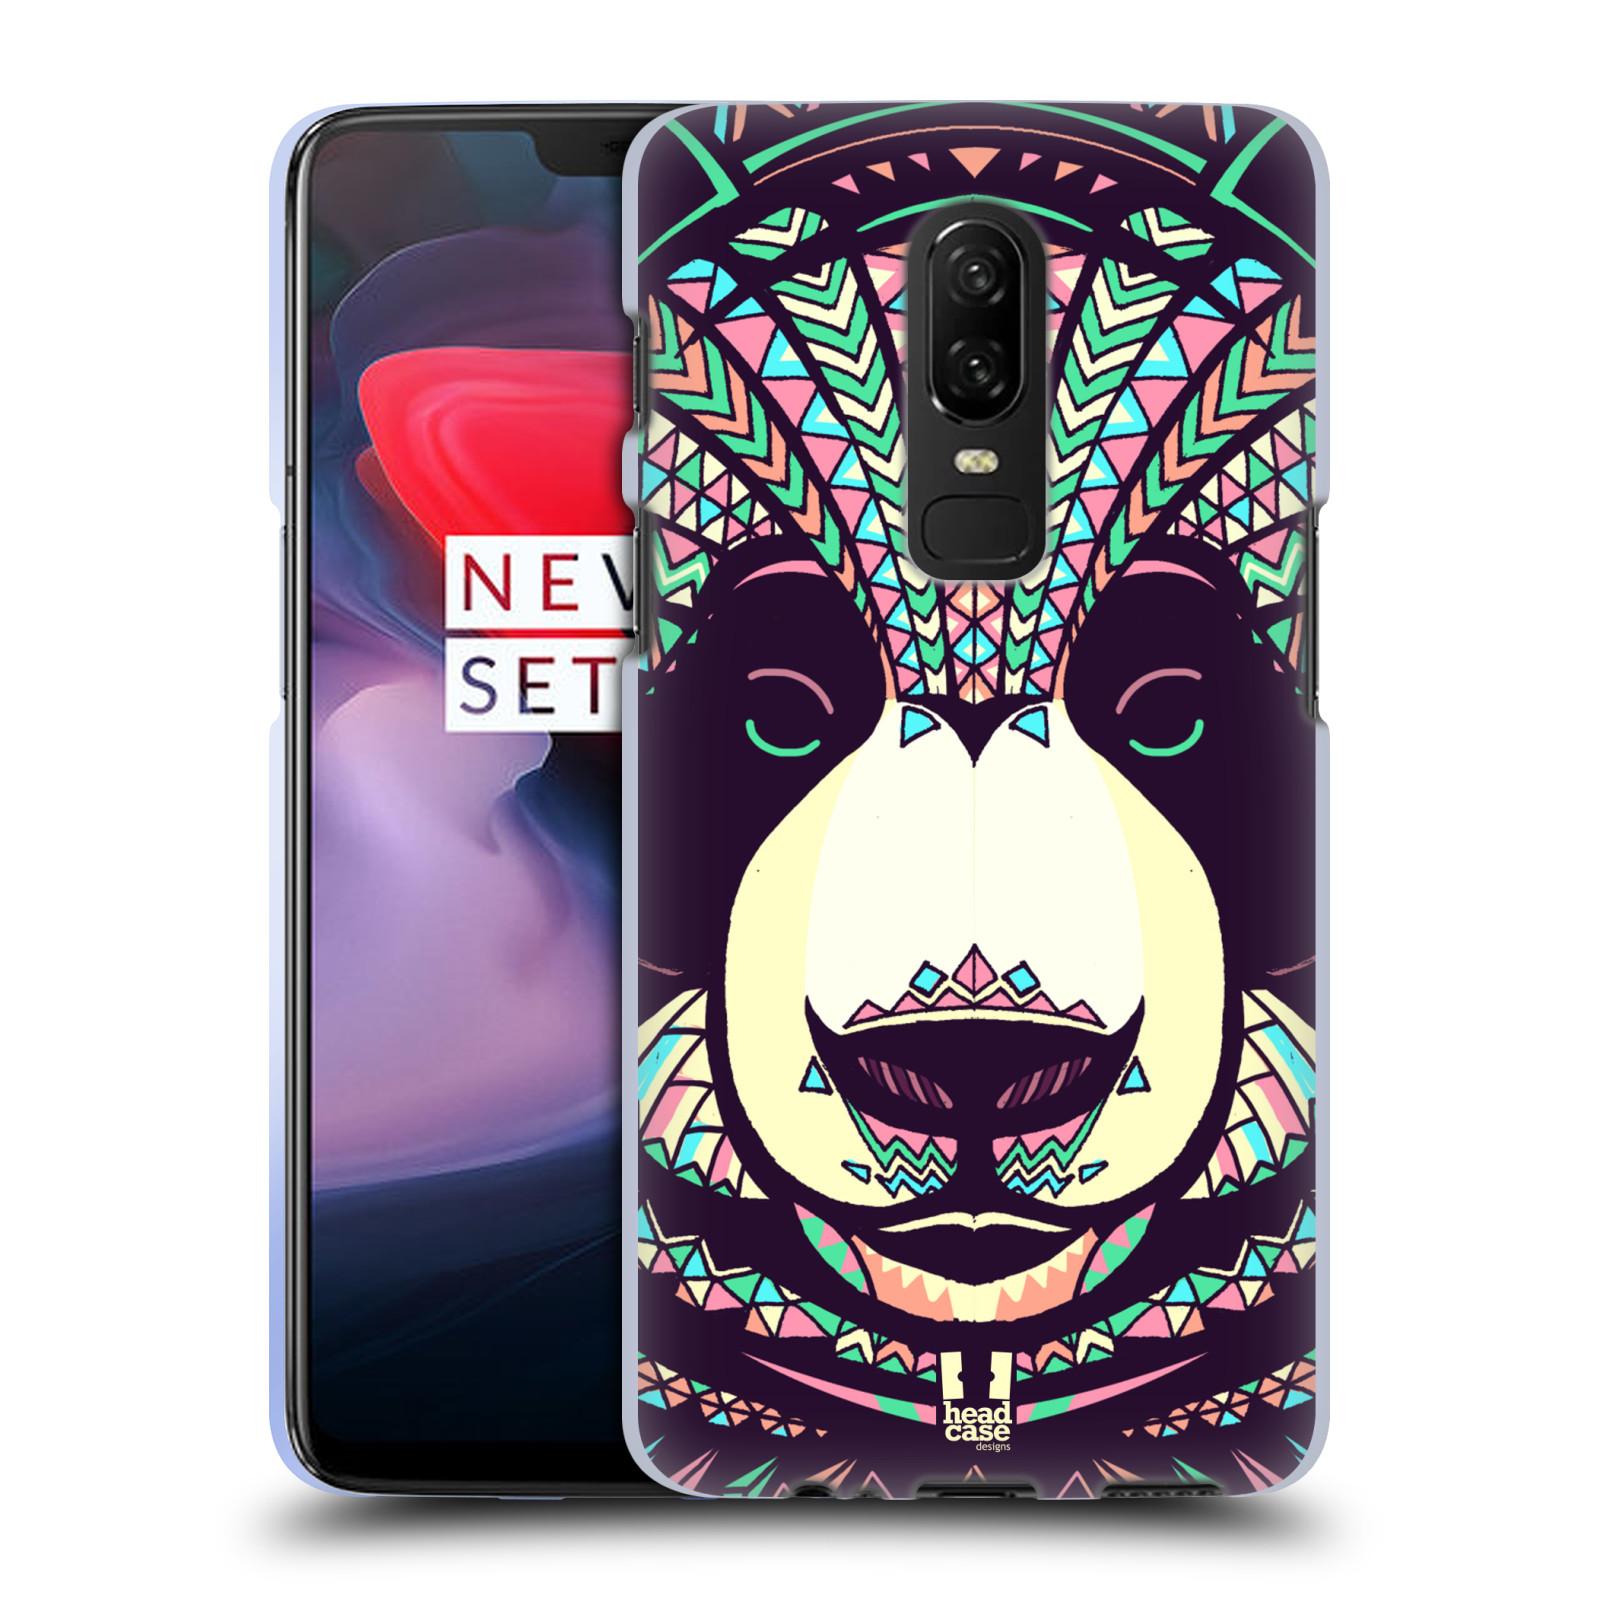 Silikonové pouzdro na mobil OnePlus 6 - Head Case - AZTEC PANDA